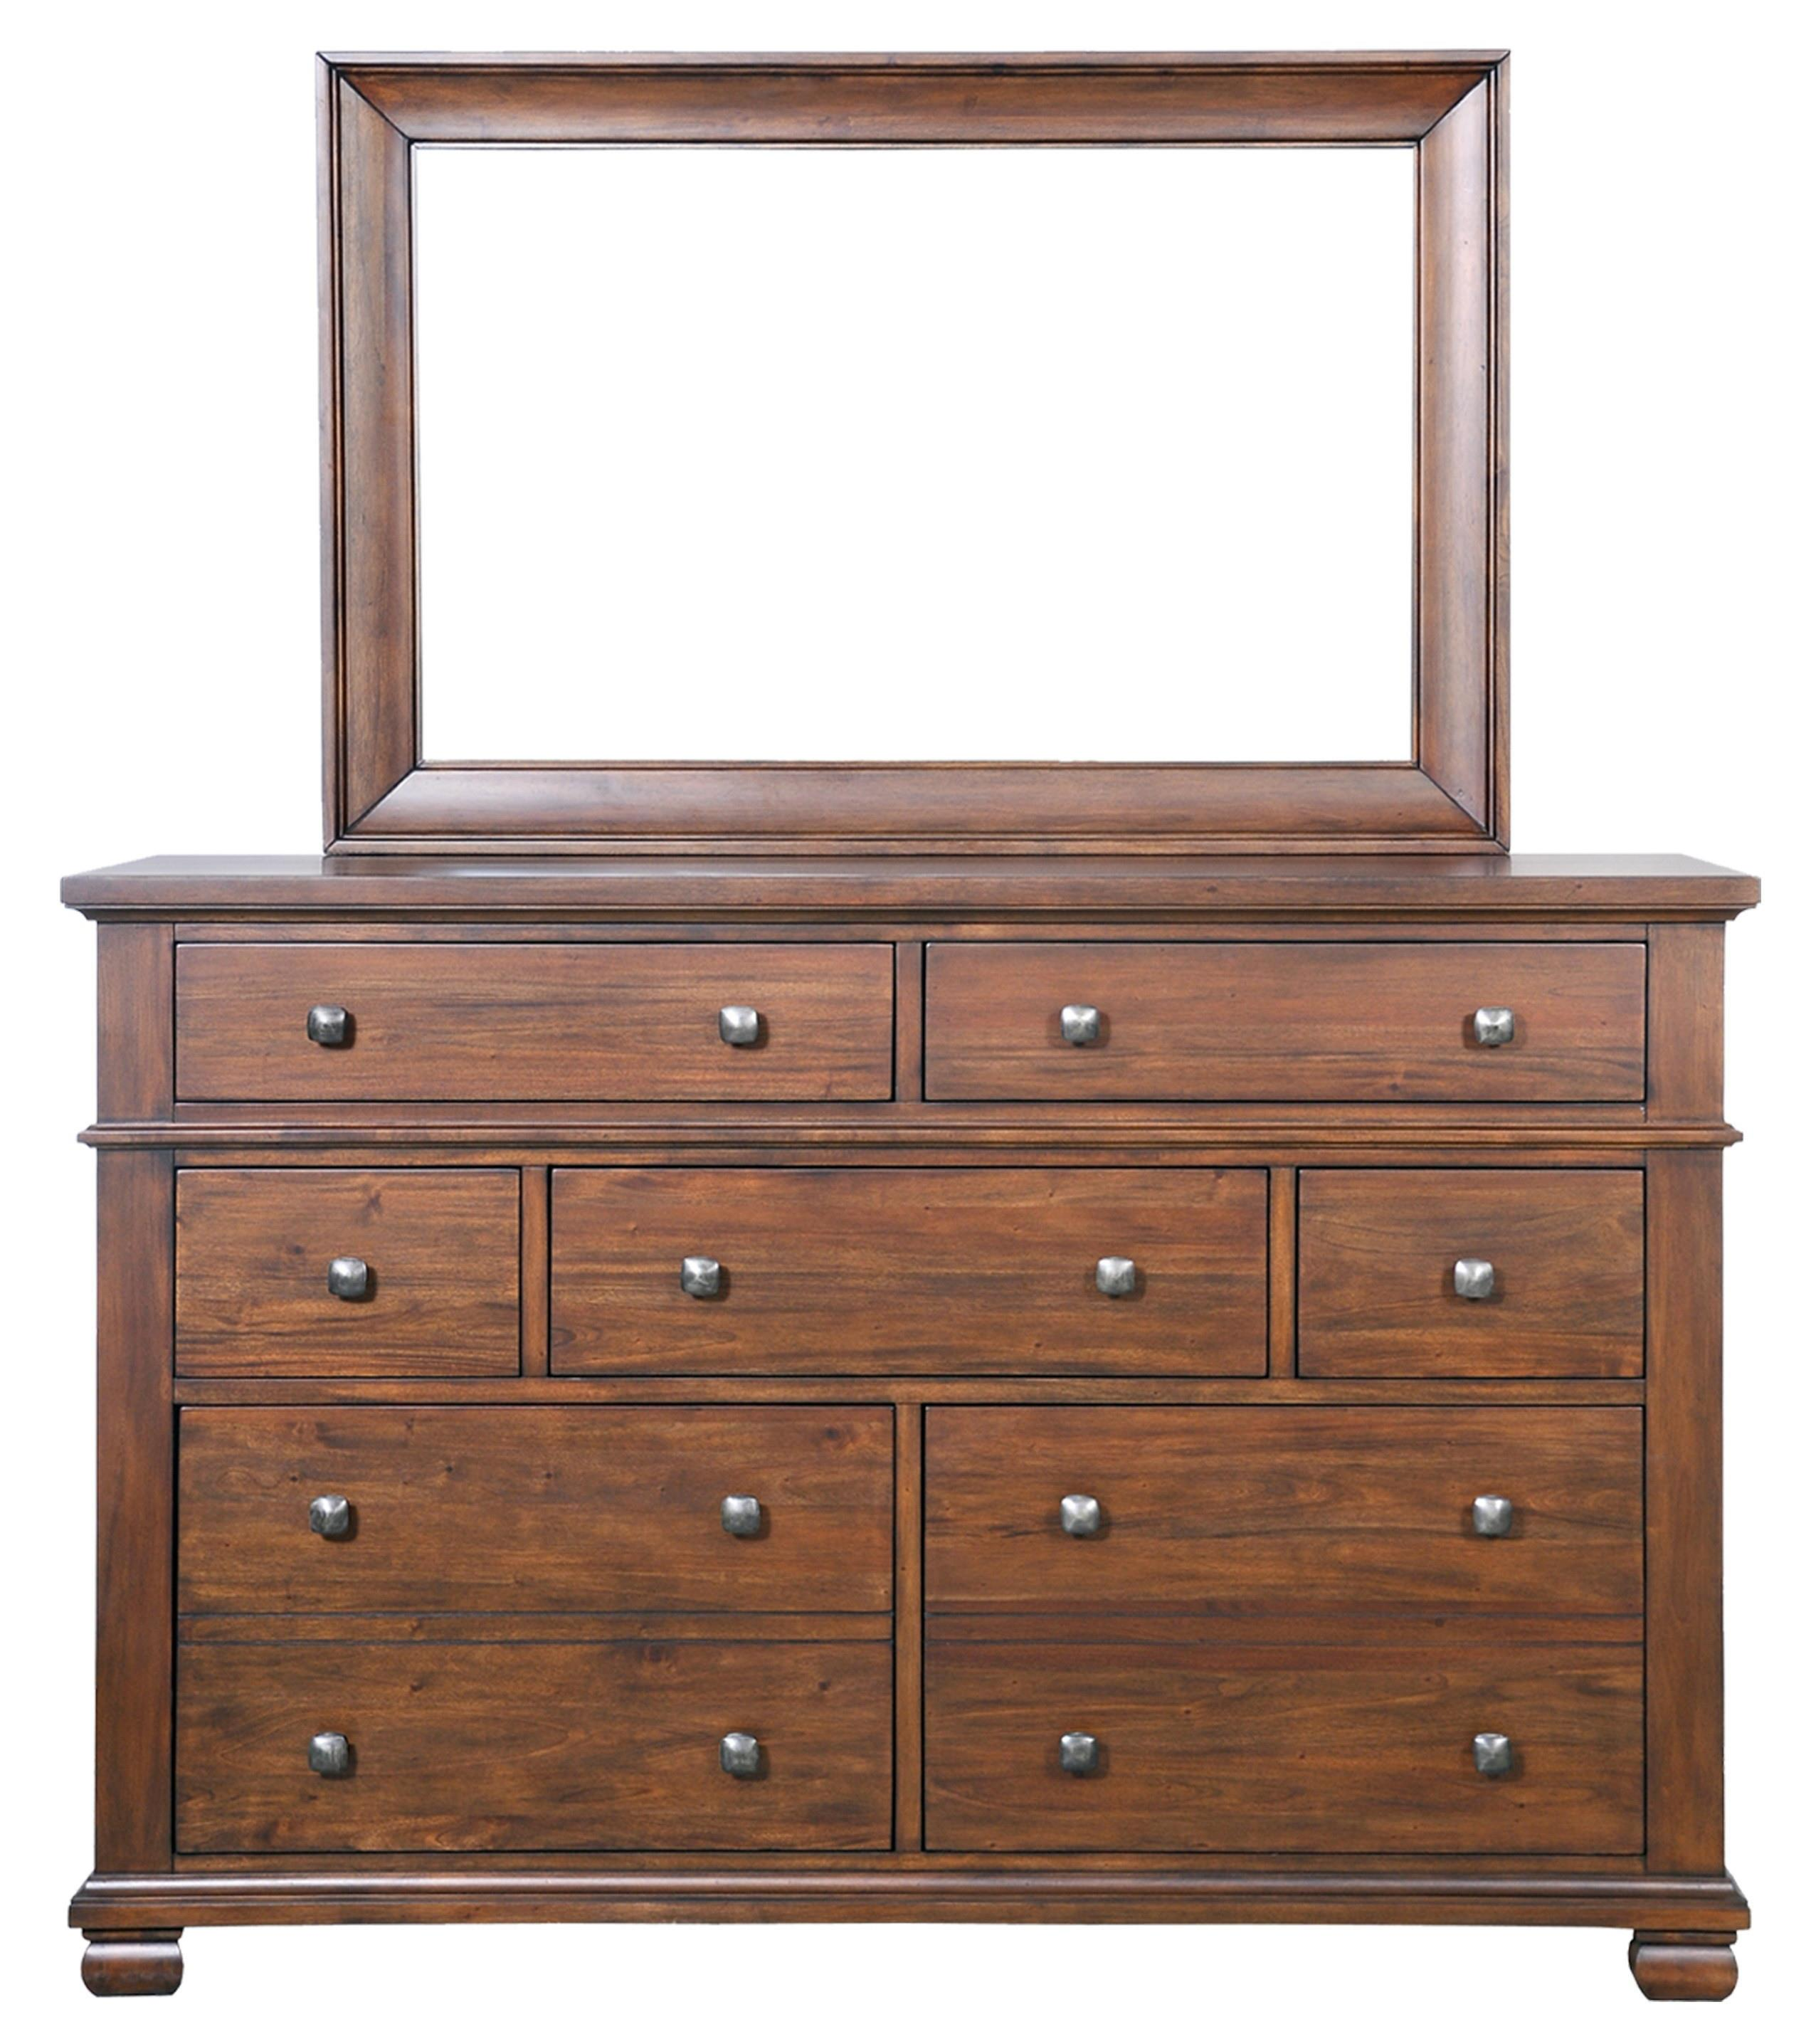 Coronado Dresser & Mirror by Harris Furniture at Powell's Furniture and Mattress